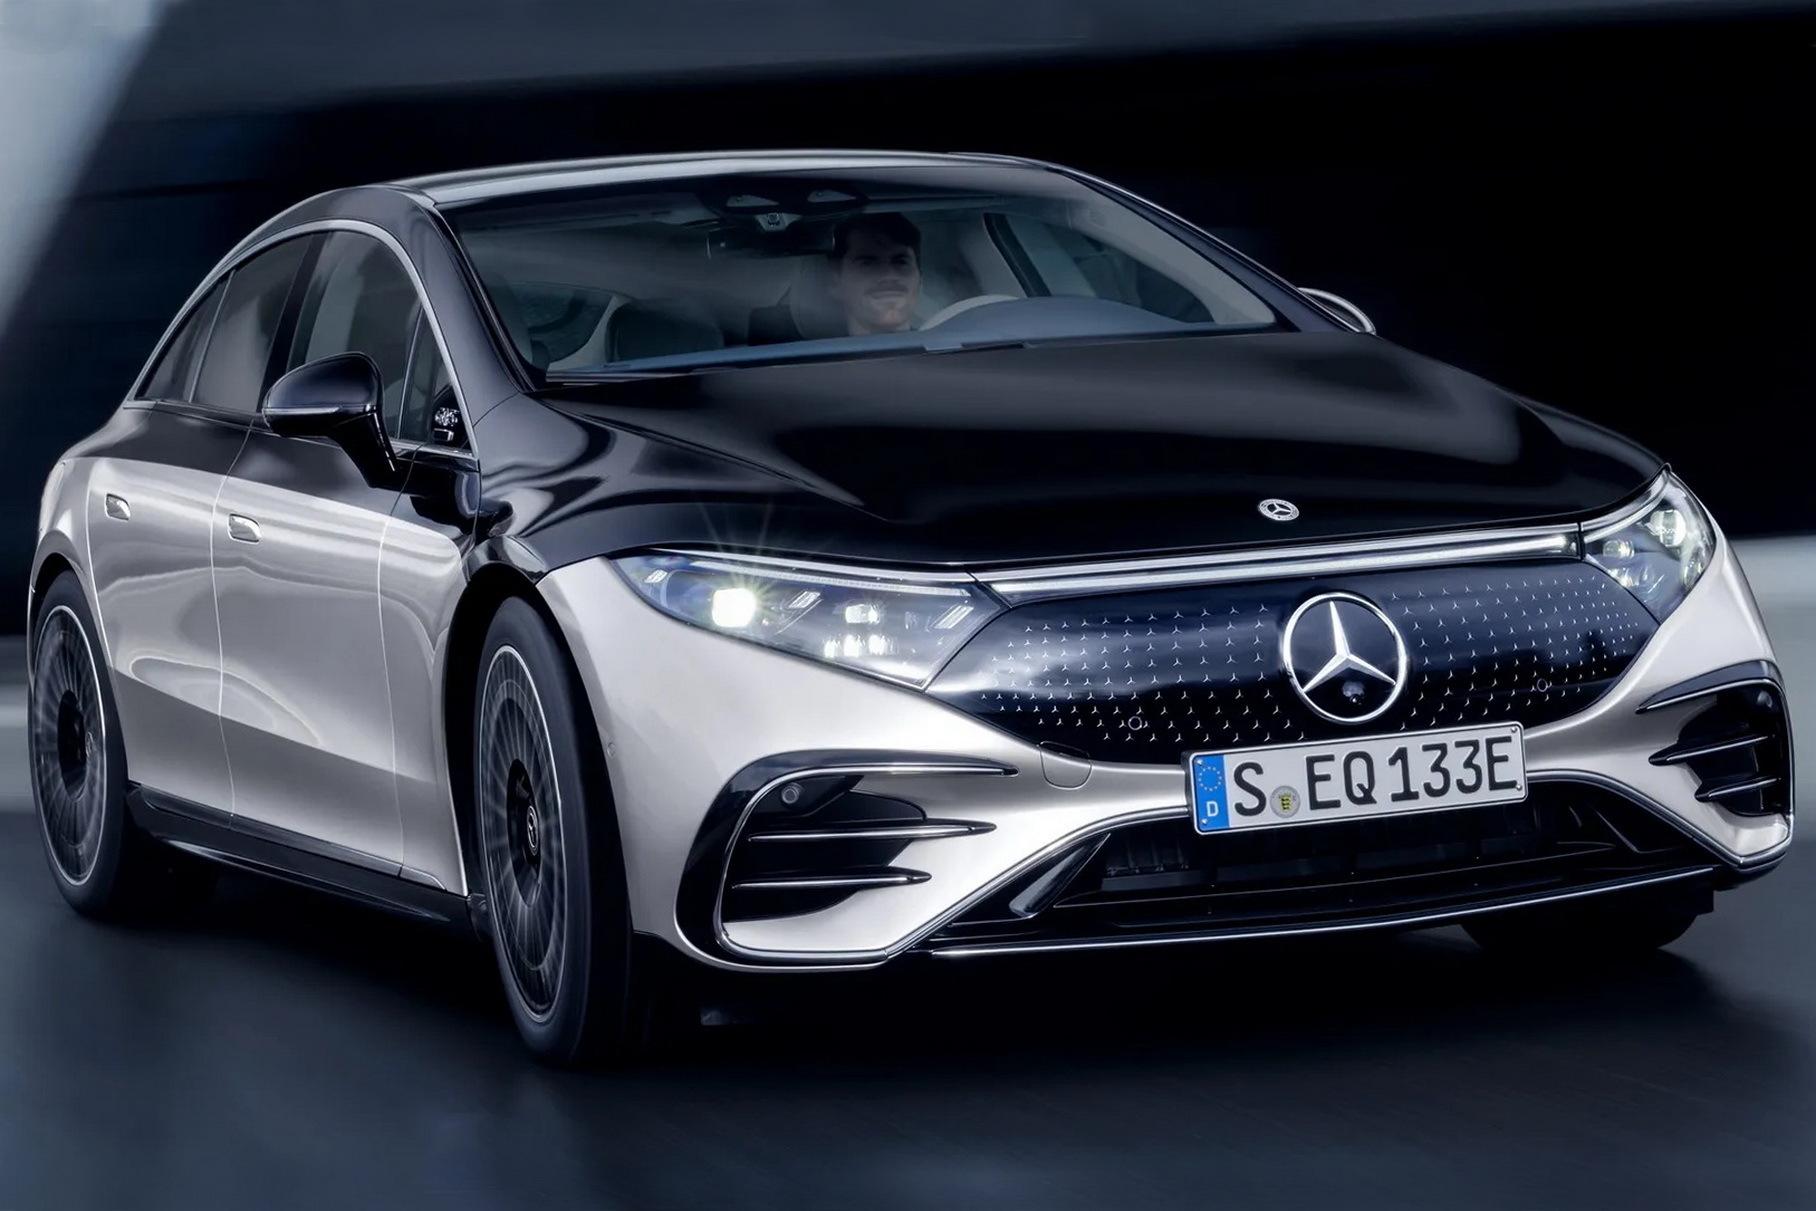 Mercedes-Benz объяснил отсутствие камер заднего вида на новом EQS